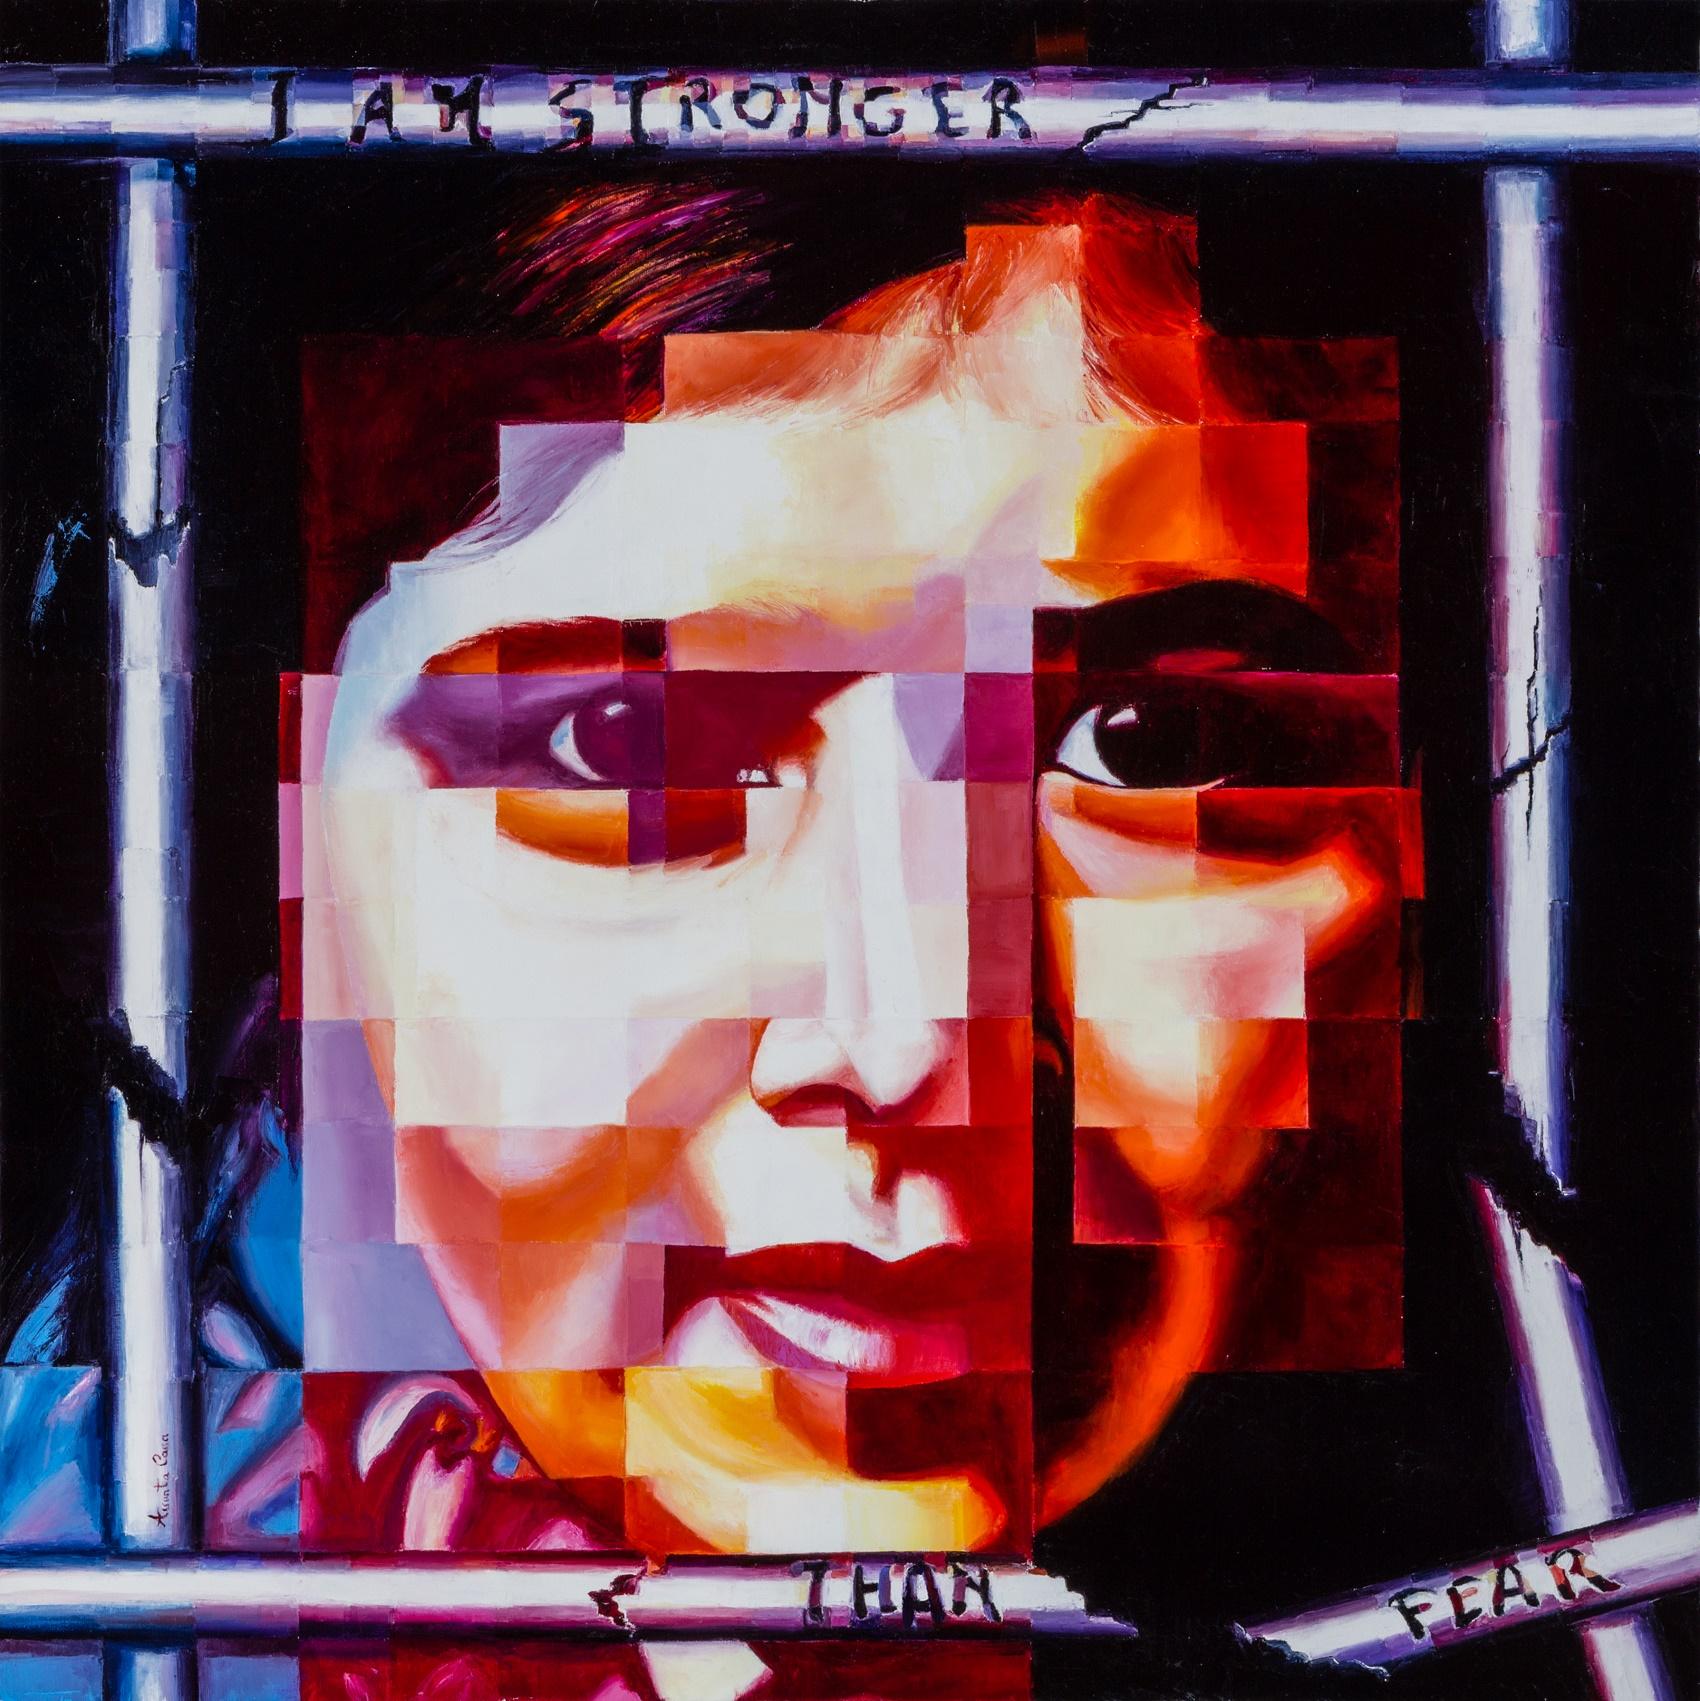 Malala. Stronger than fear